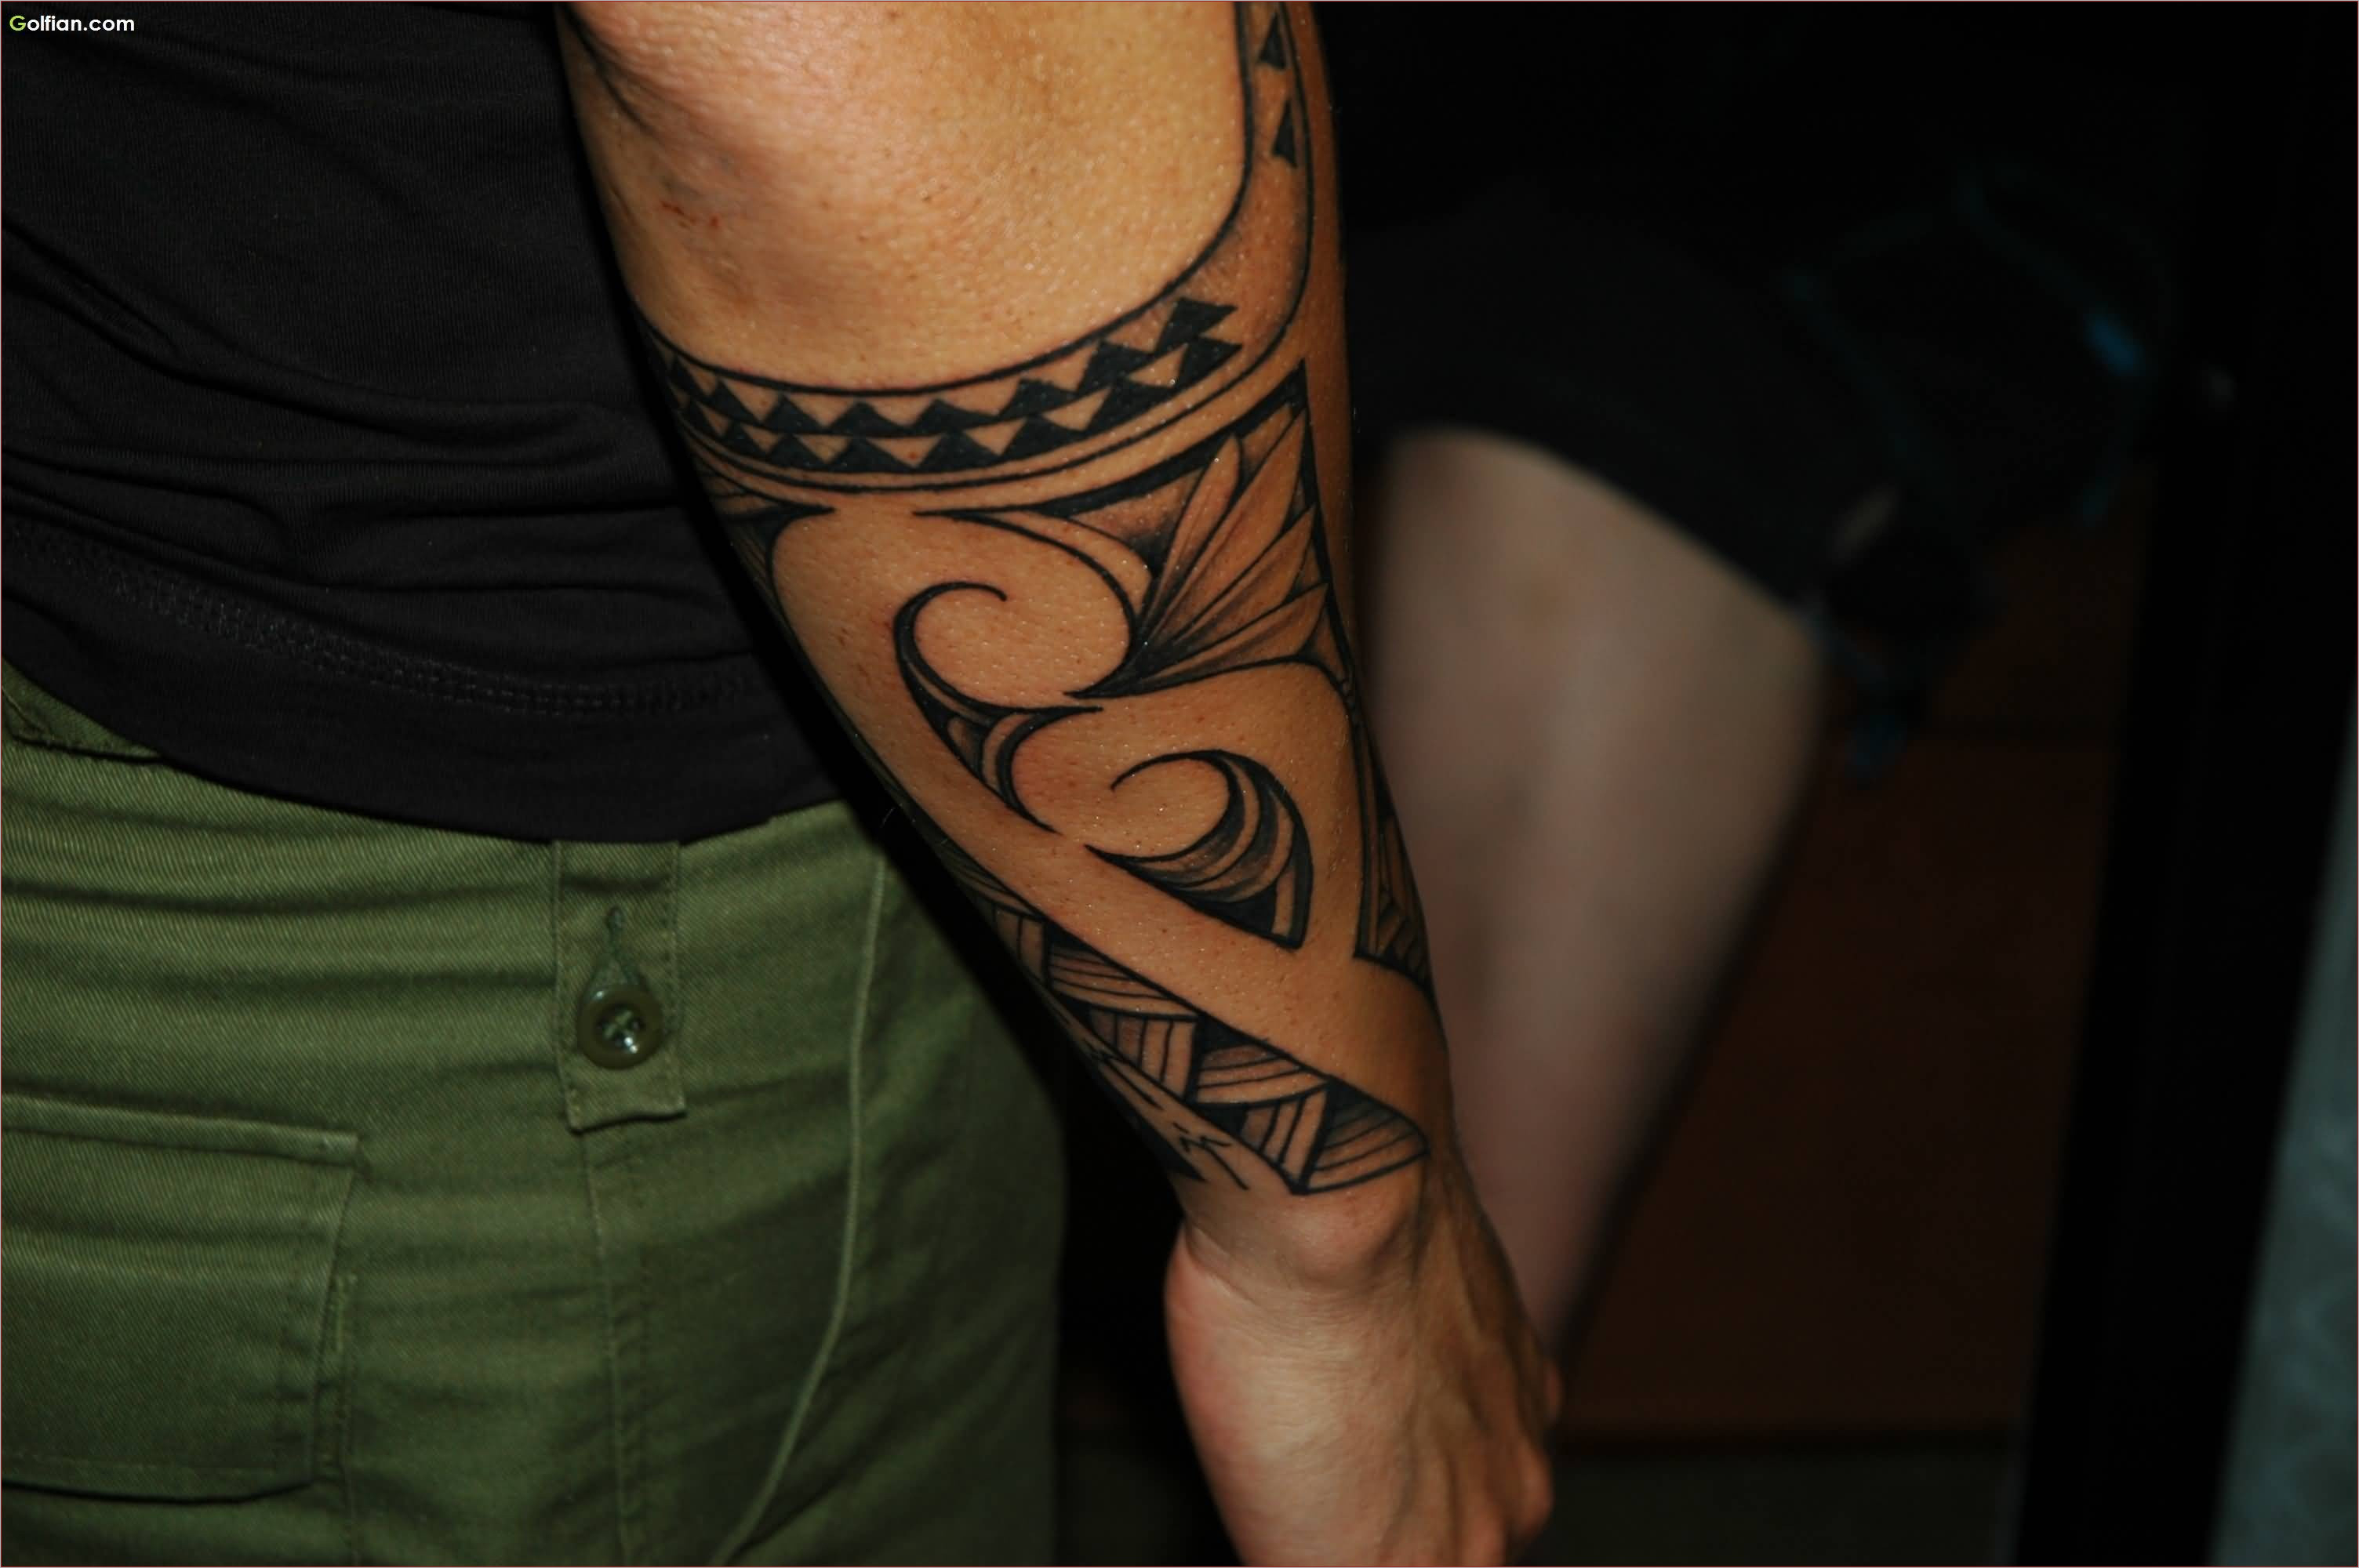 Inspirational Mens Forearm Tribal Tattoo Designs Design Kiyana Jule in dimensions 3008 X 2000